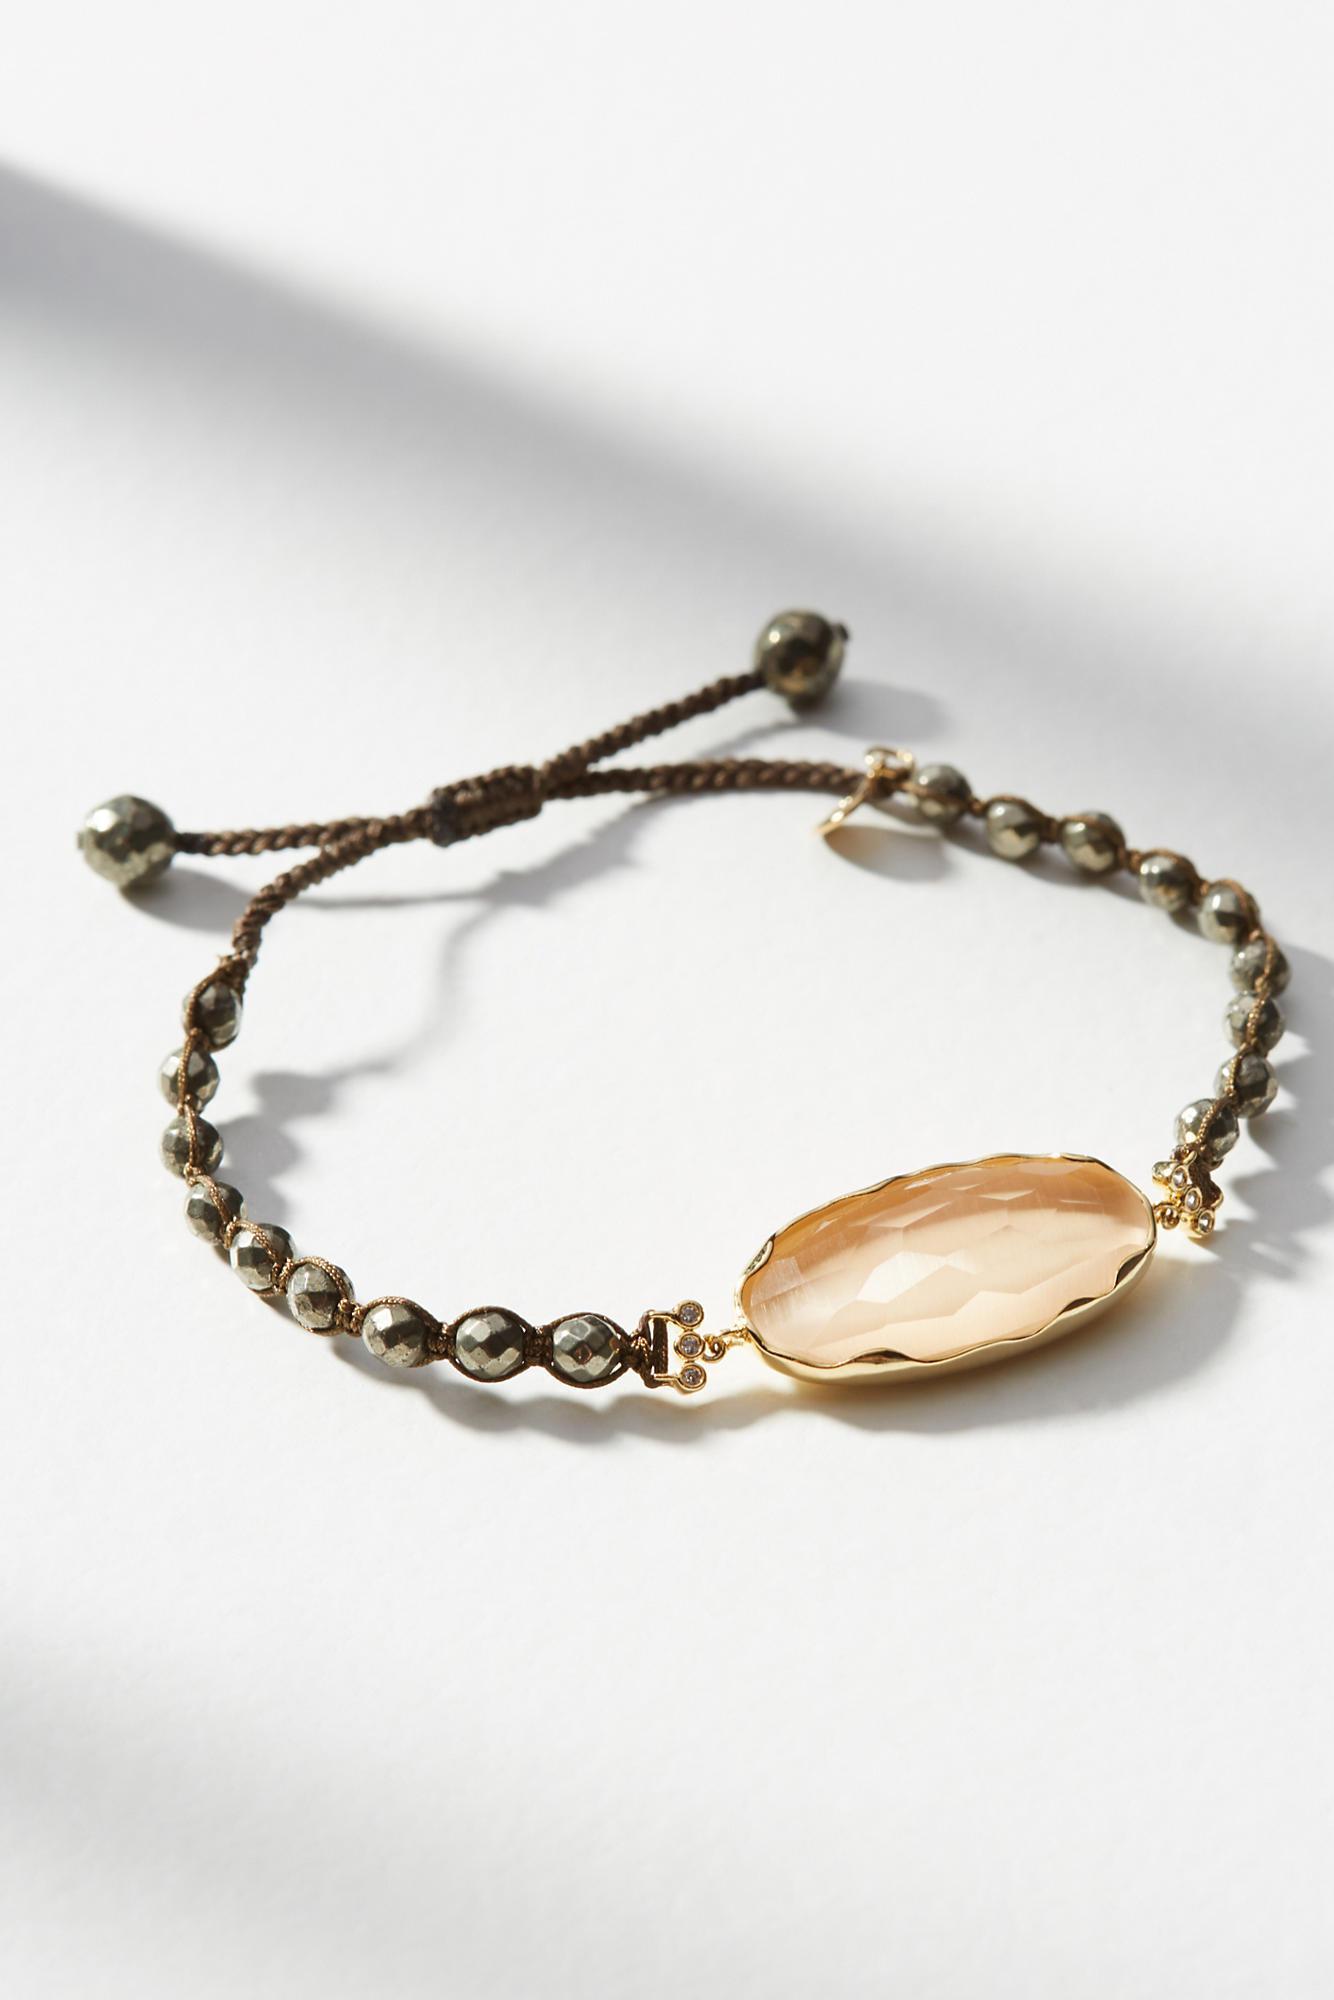 Anthropologie Demi Stone Bracelet sxxfv